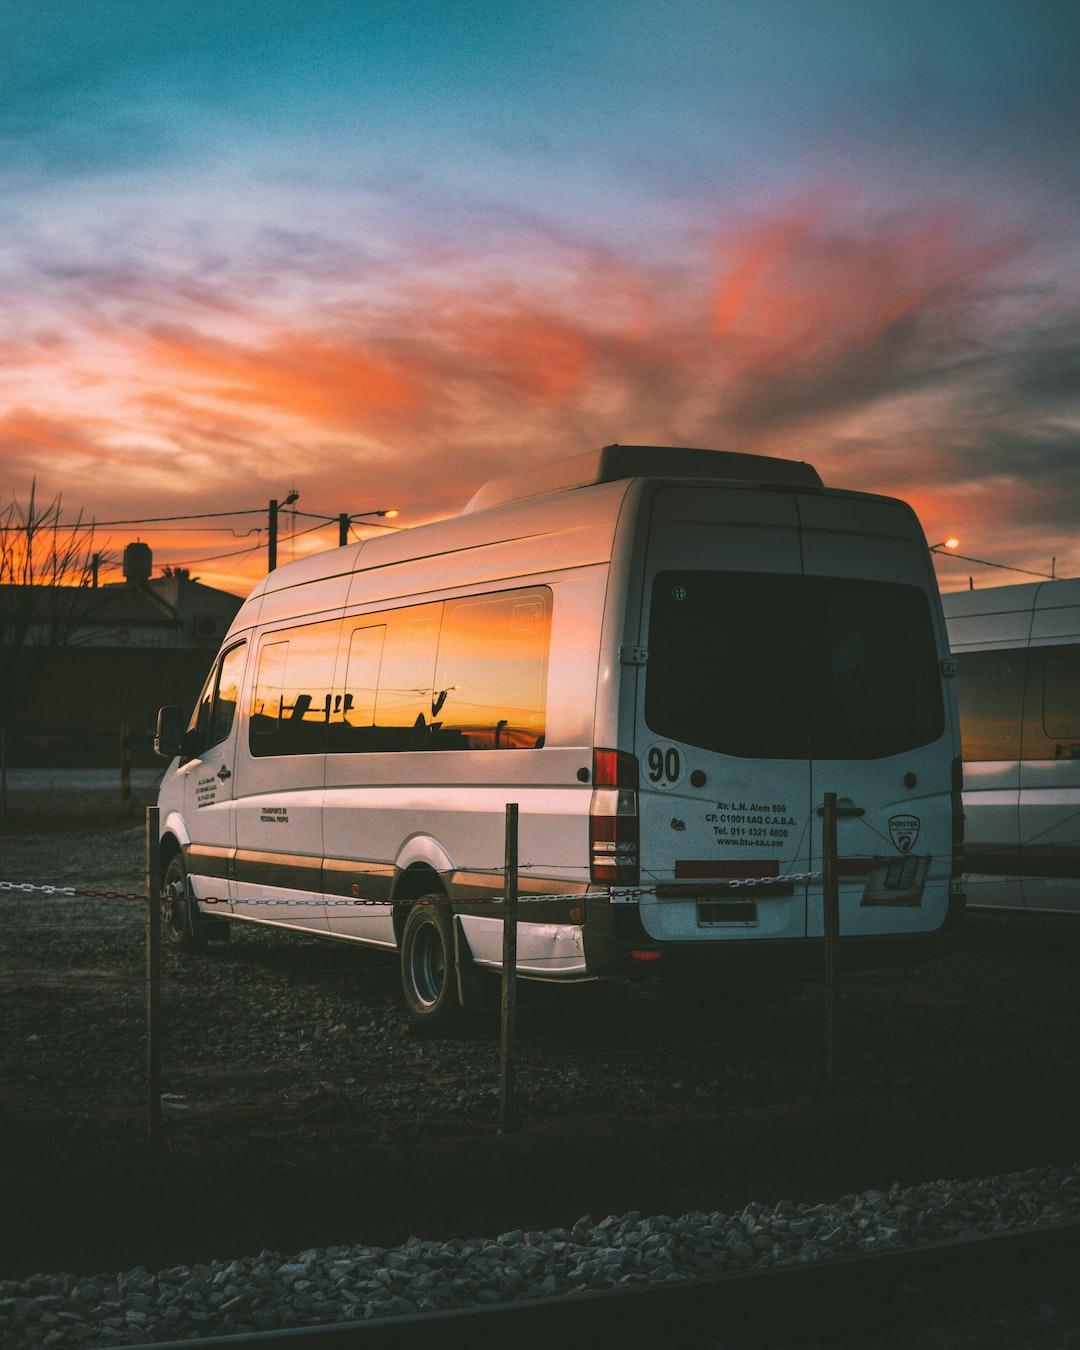 Van parking with sunset sky